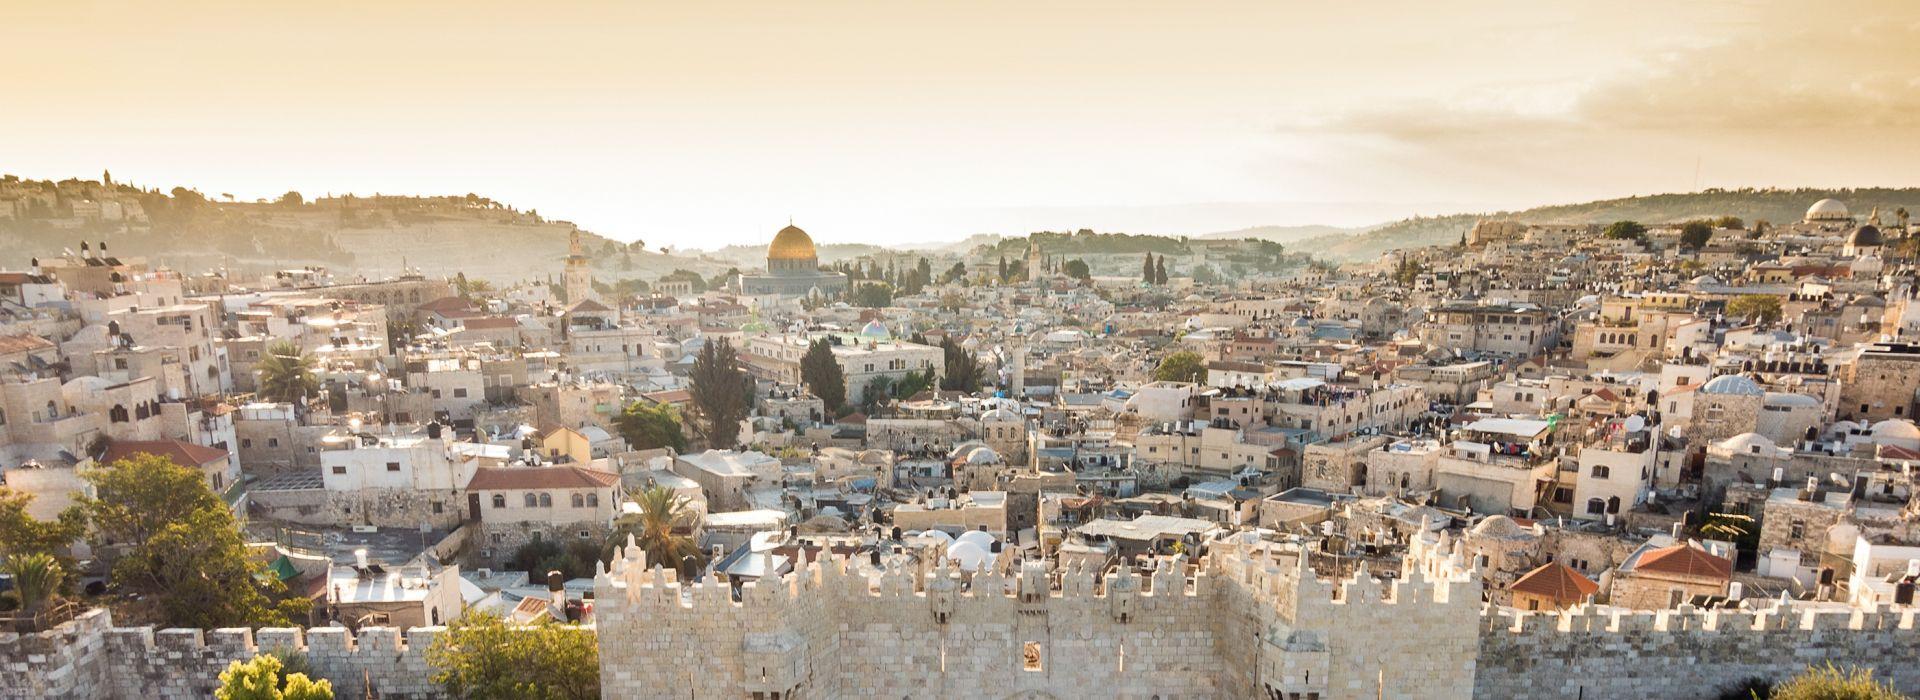 Adventure and sport activities Tours in Israel